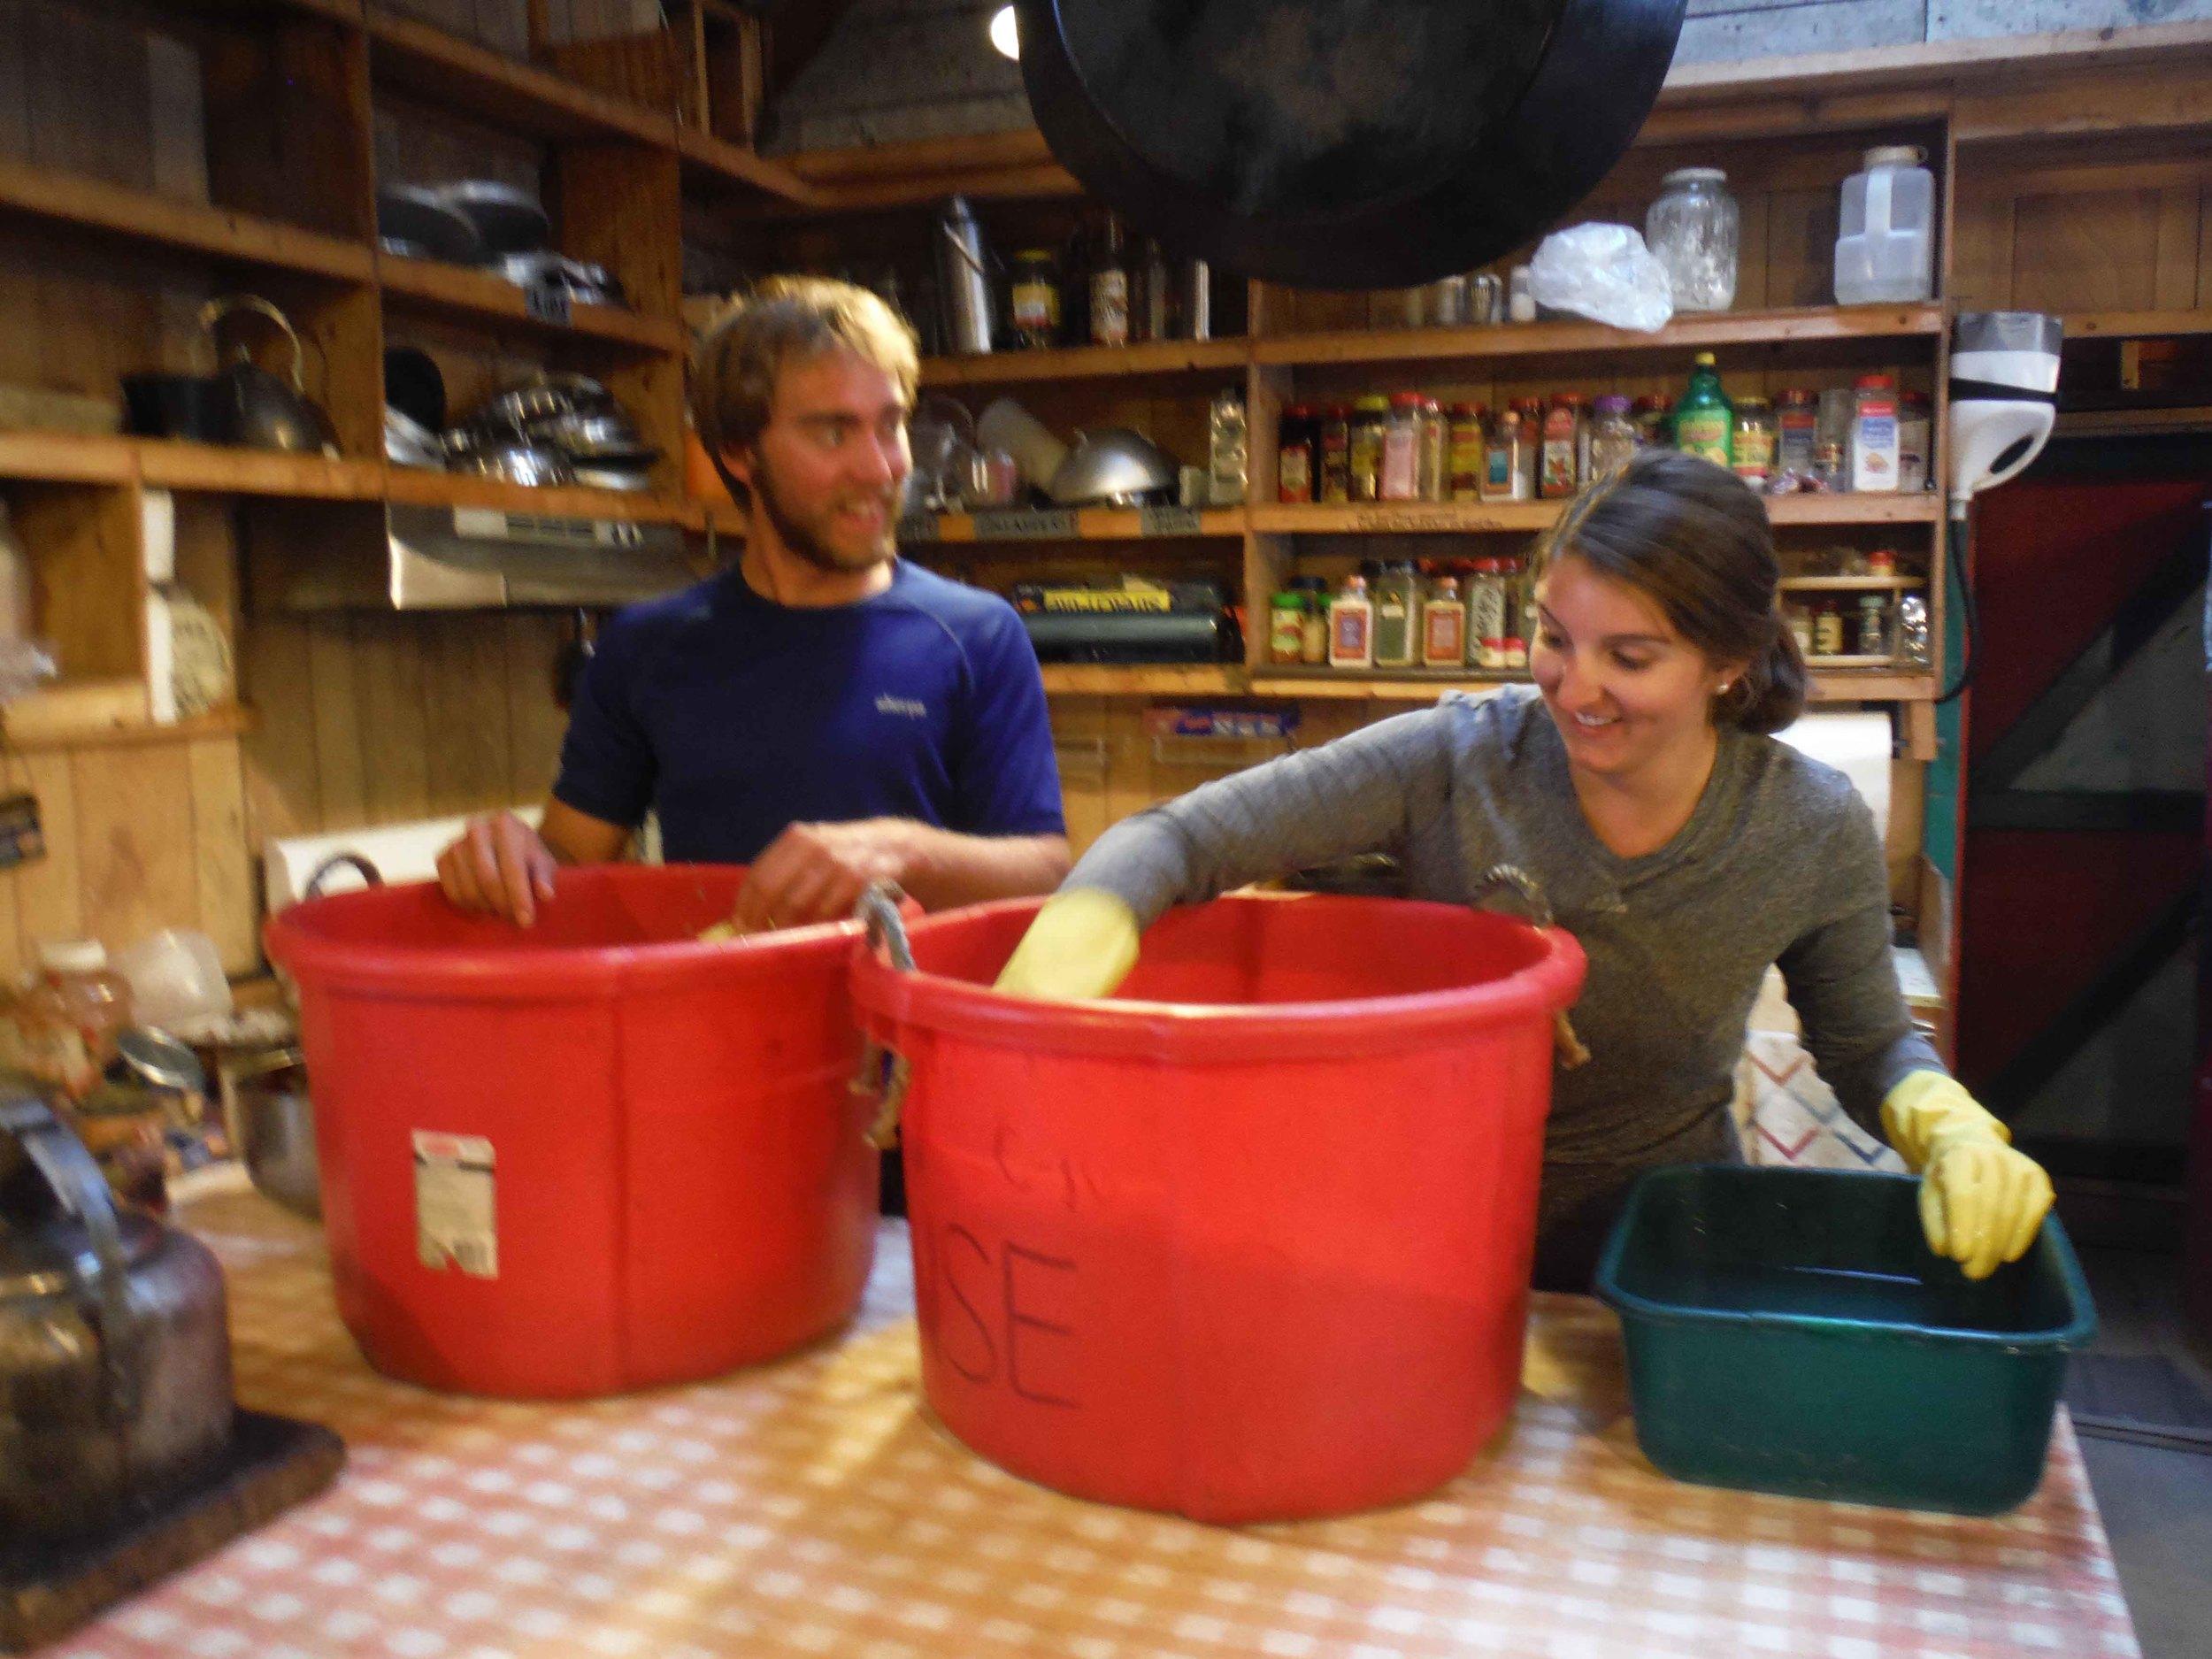 Jon Doty and Lindsay Starr hard at work. Photo by Sarah Bouckoms